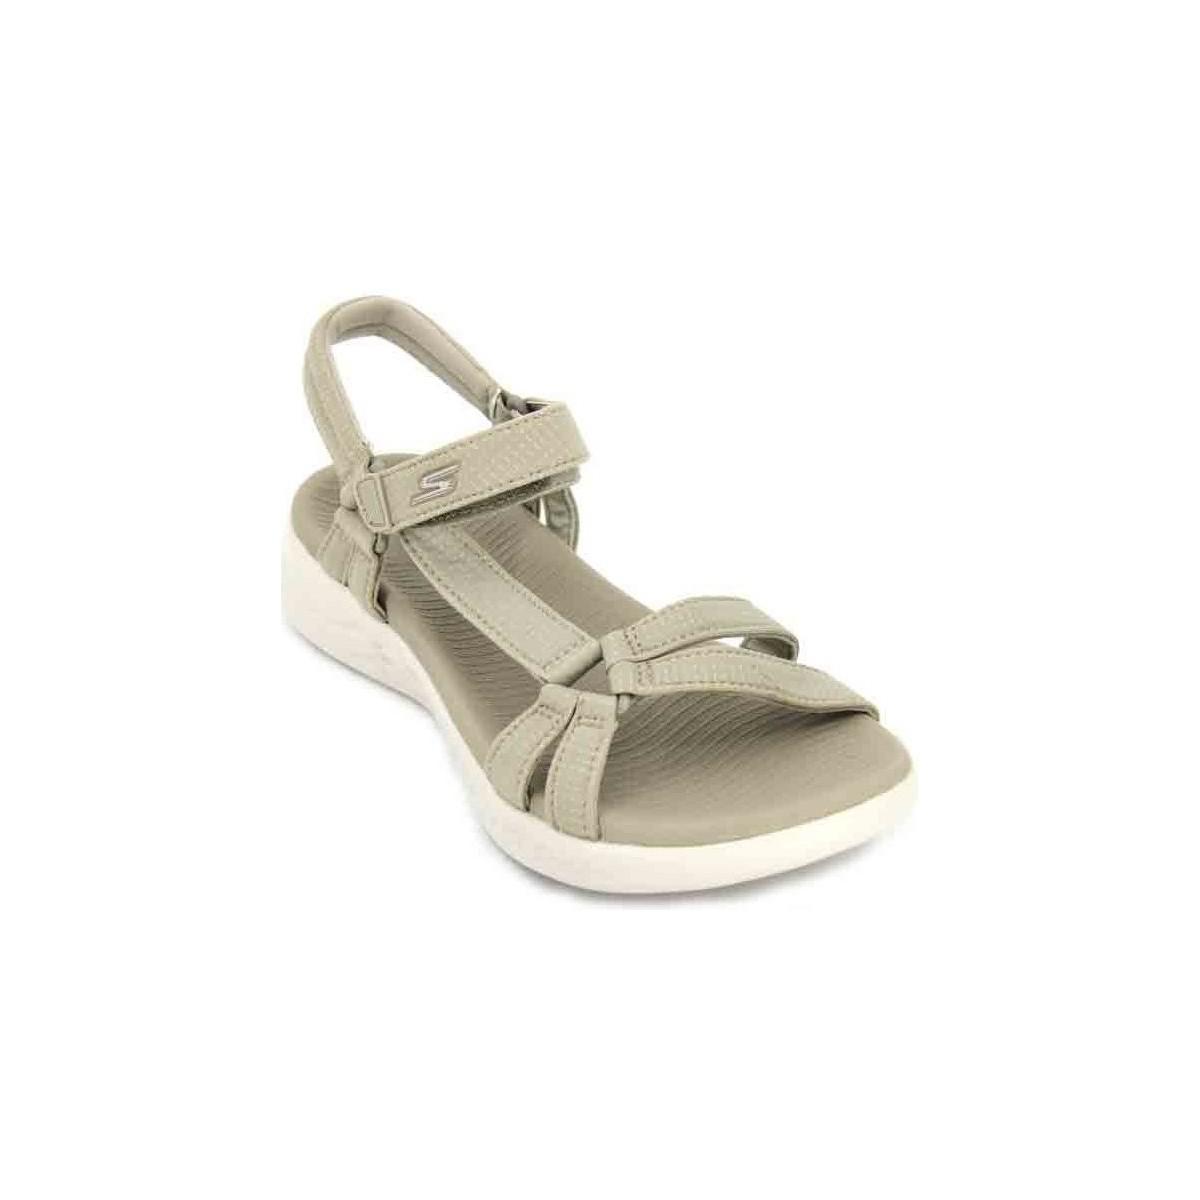 1cc6e2caeec3 Skechers On The Go 600 Brilliancy 15316 Women s Sandals Women s ...